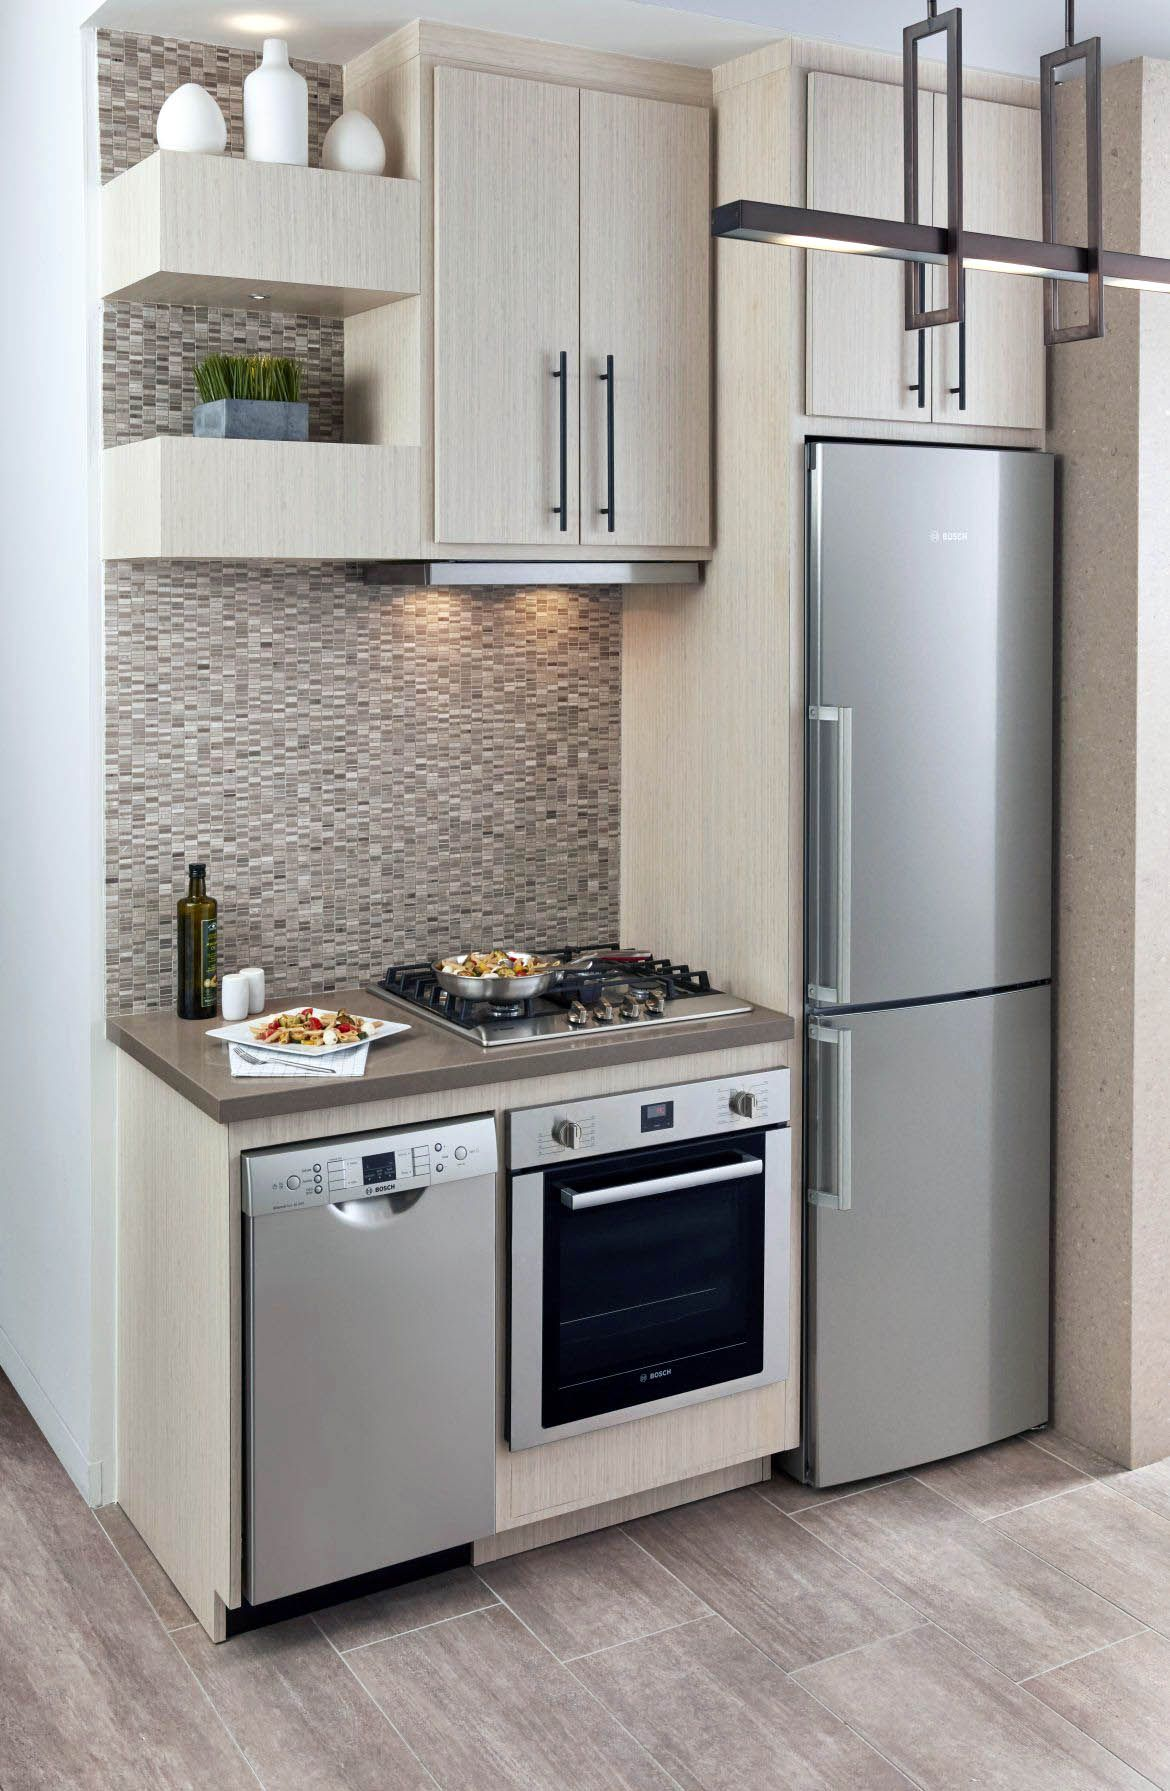 Fresh Tiny Kitchen Cabinet Ideas Fridge Next To Stove On This Favorite Site Simple Kitchen Design Kitchen Design Small Space Tiny House Kitchen Appliances